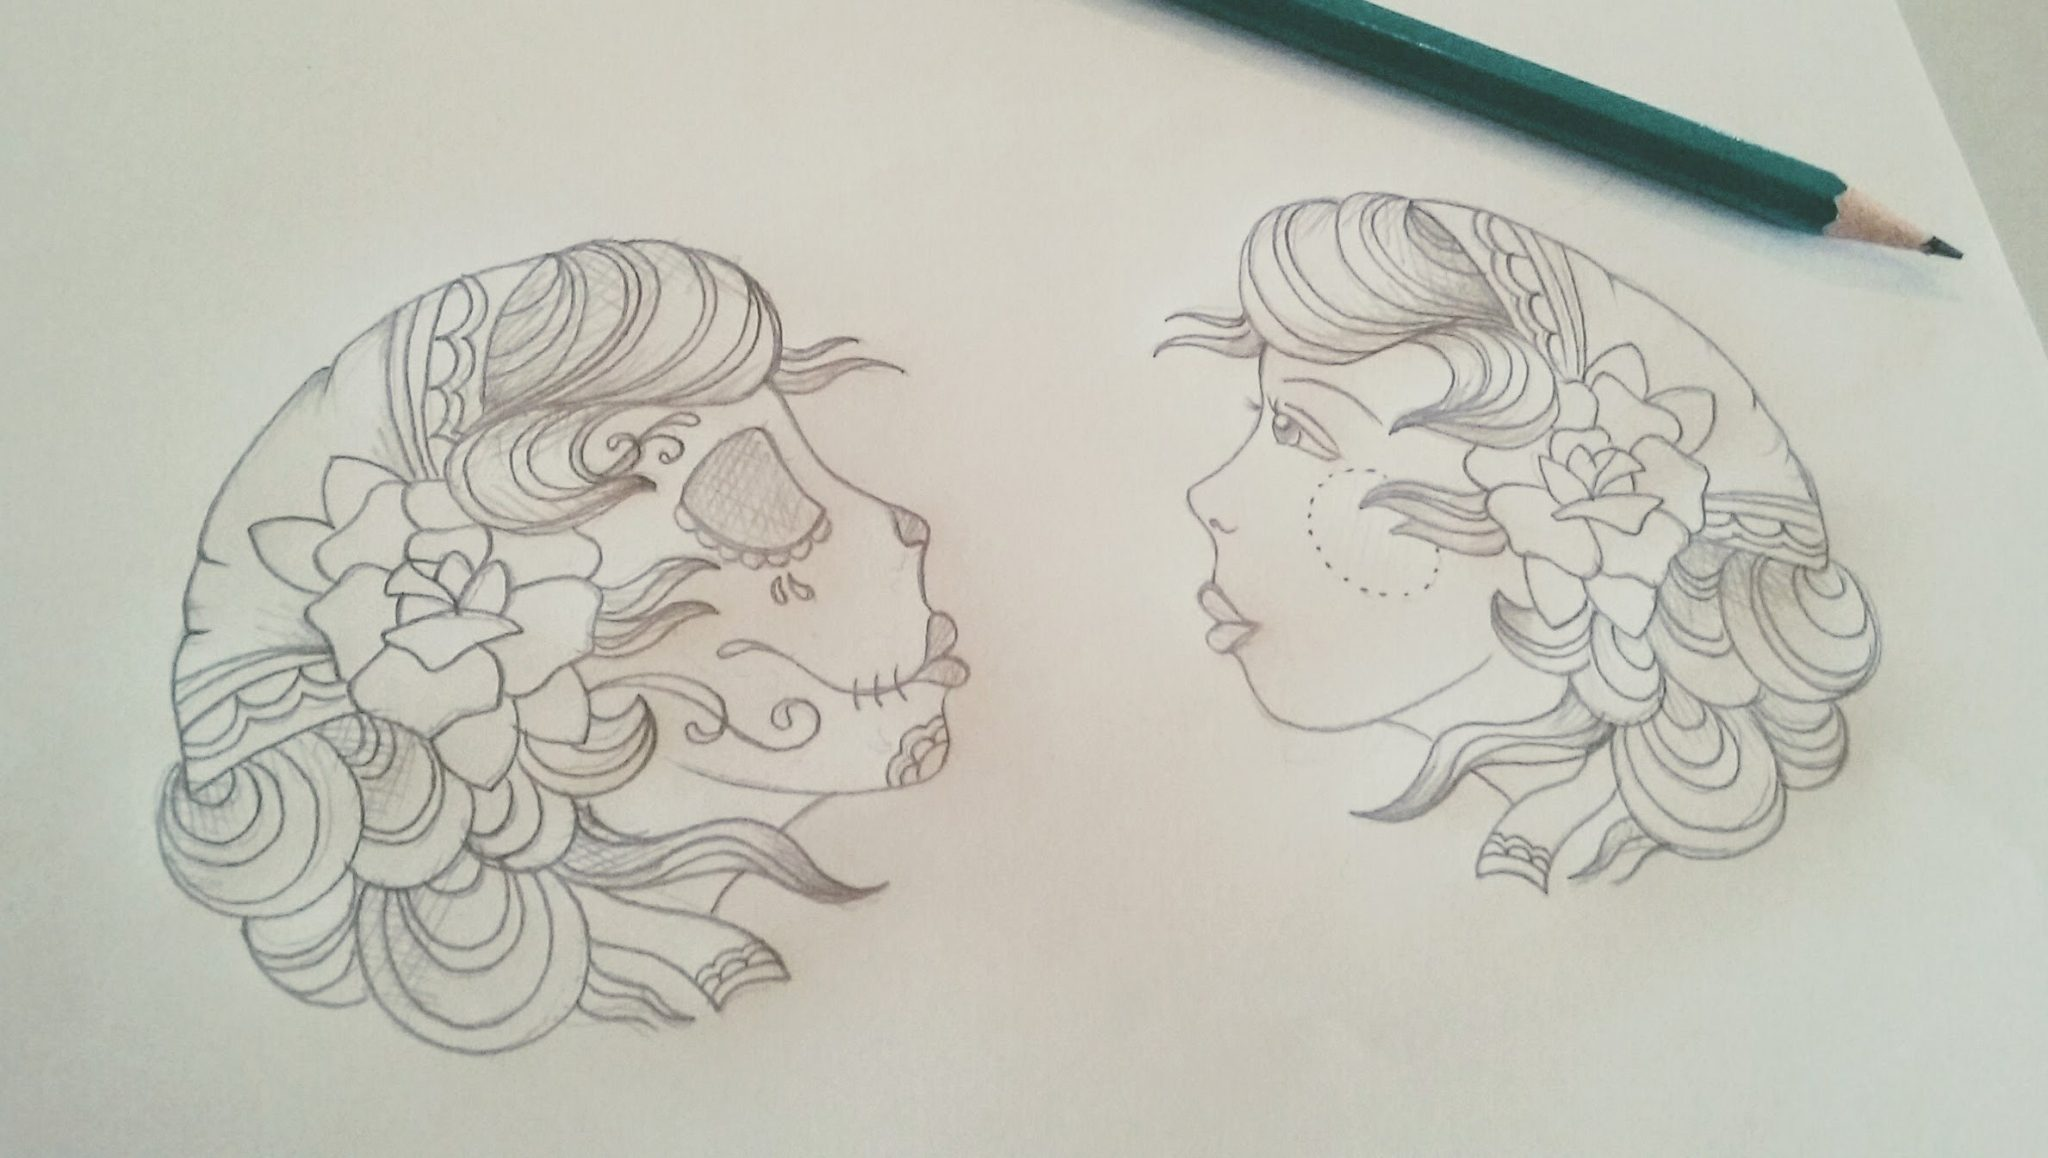 Hand Tattoos Initial Sketch Katehelenmuir